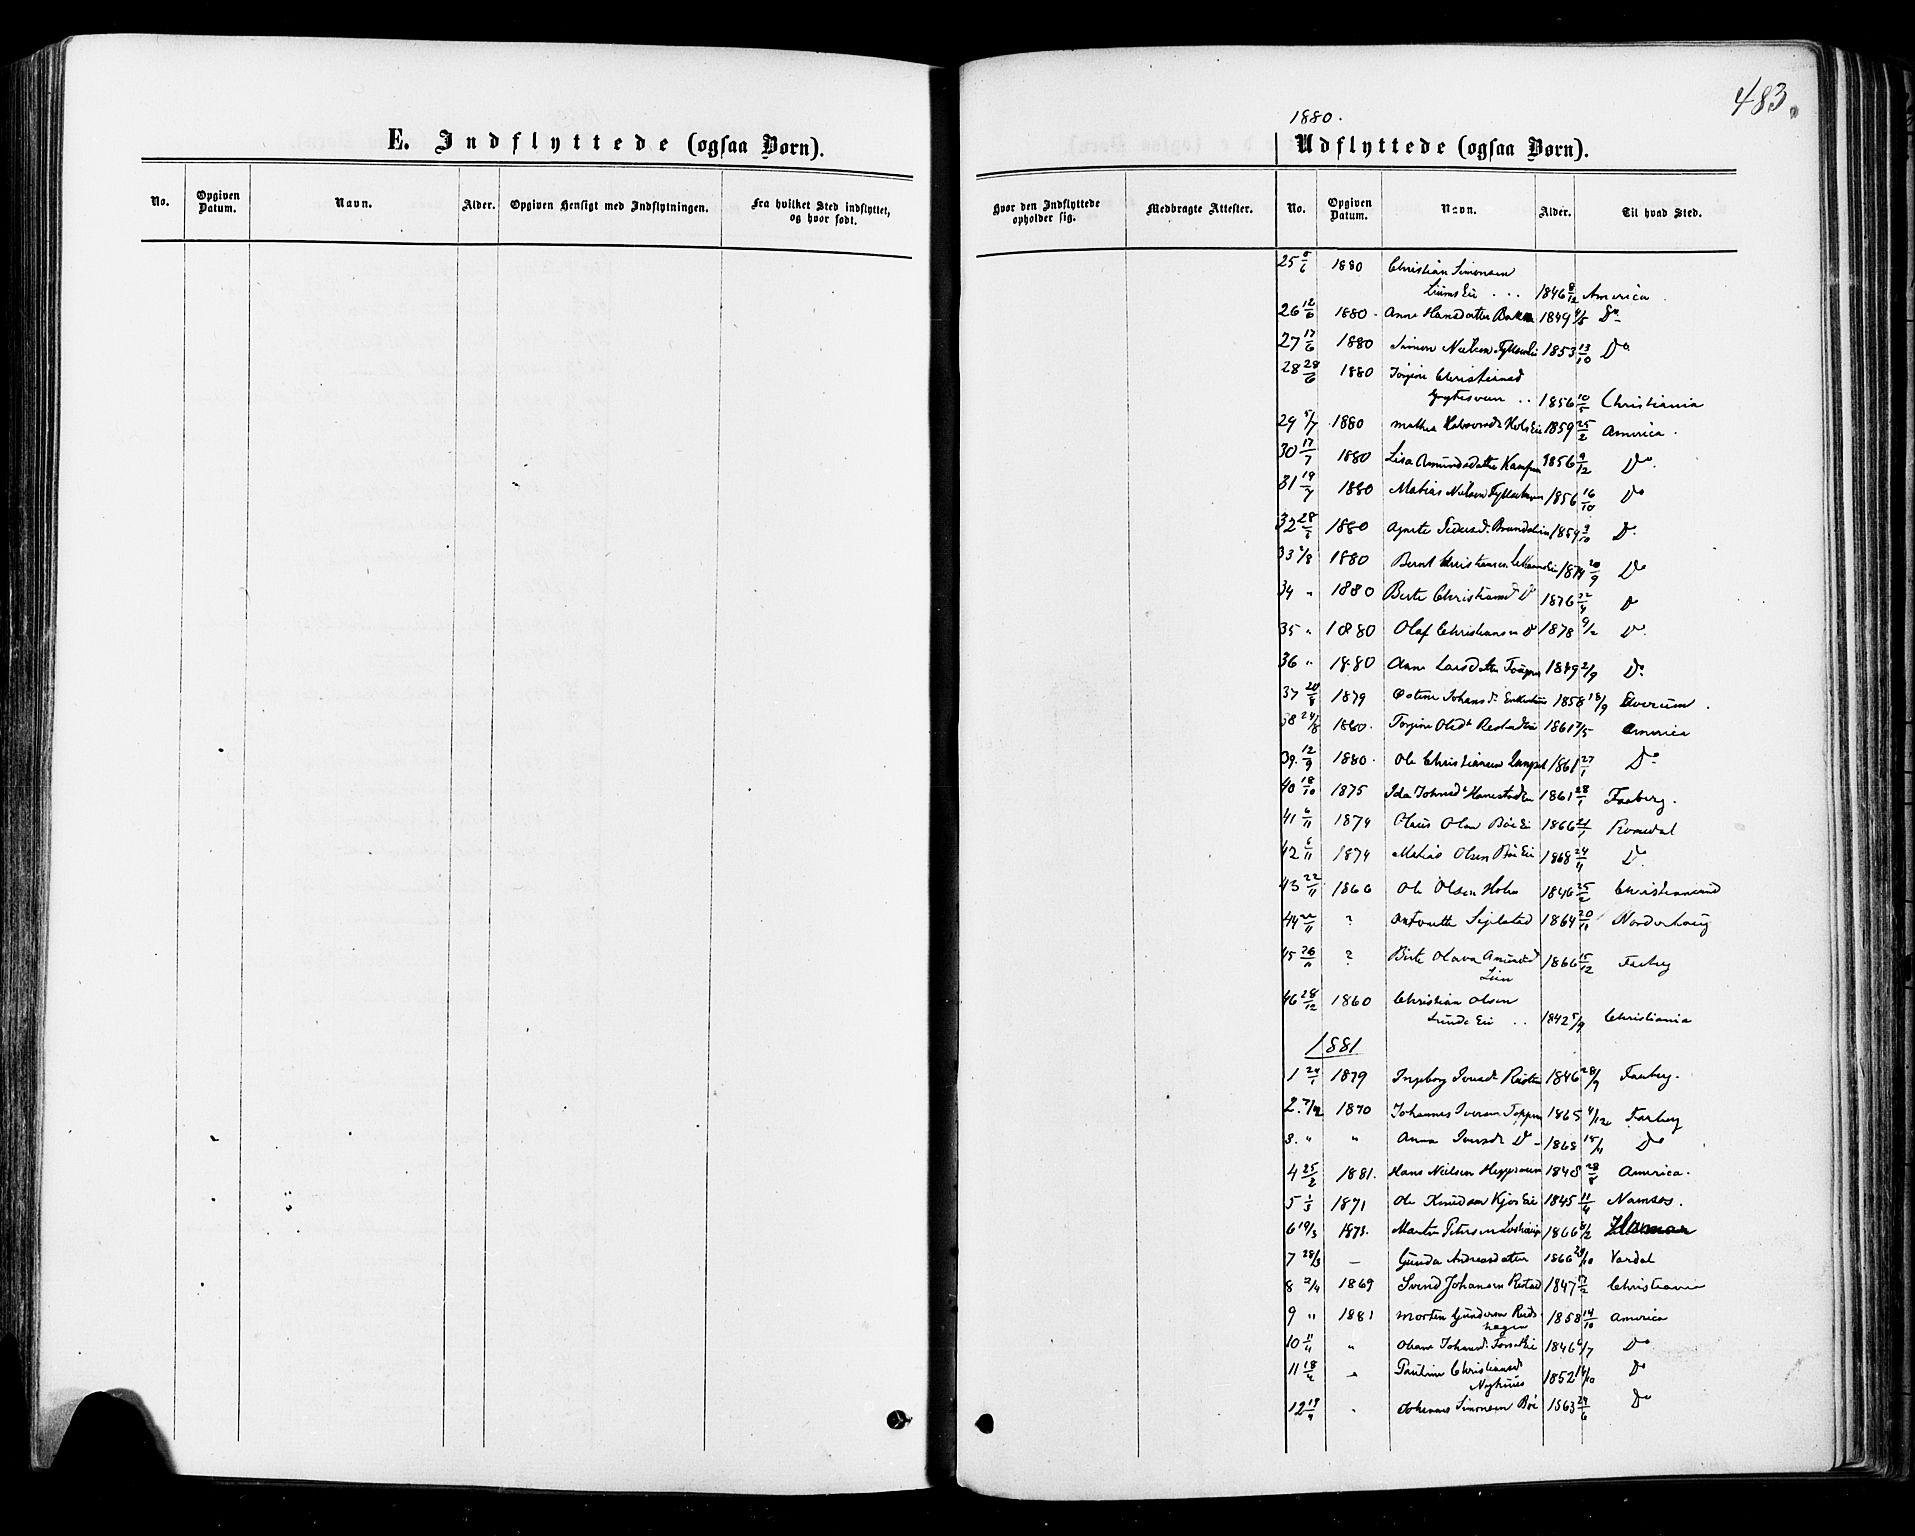 SAH, Østre Gausdal prestekontor, Ministerialbok nr. 1, 1874-1886, s. 483